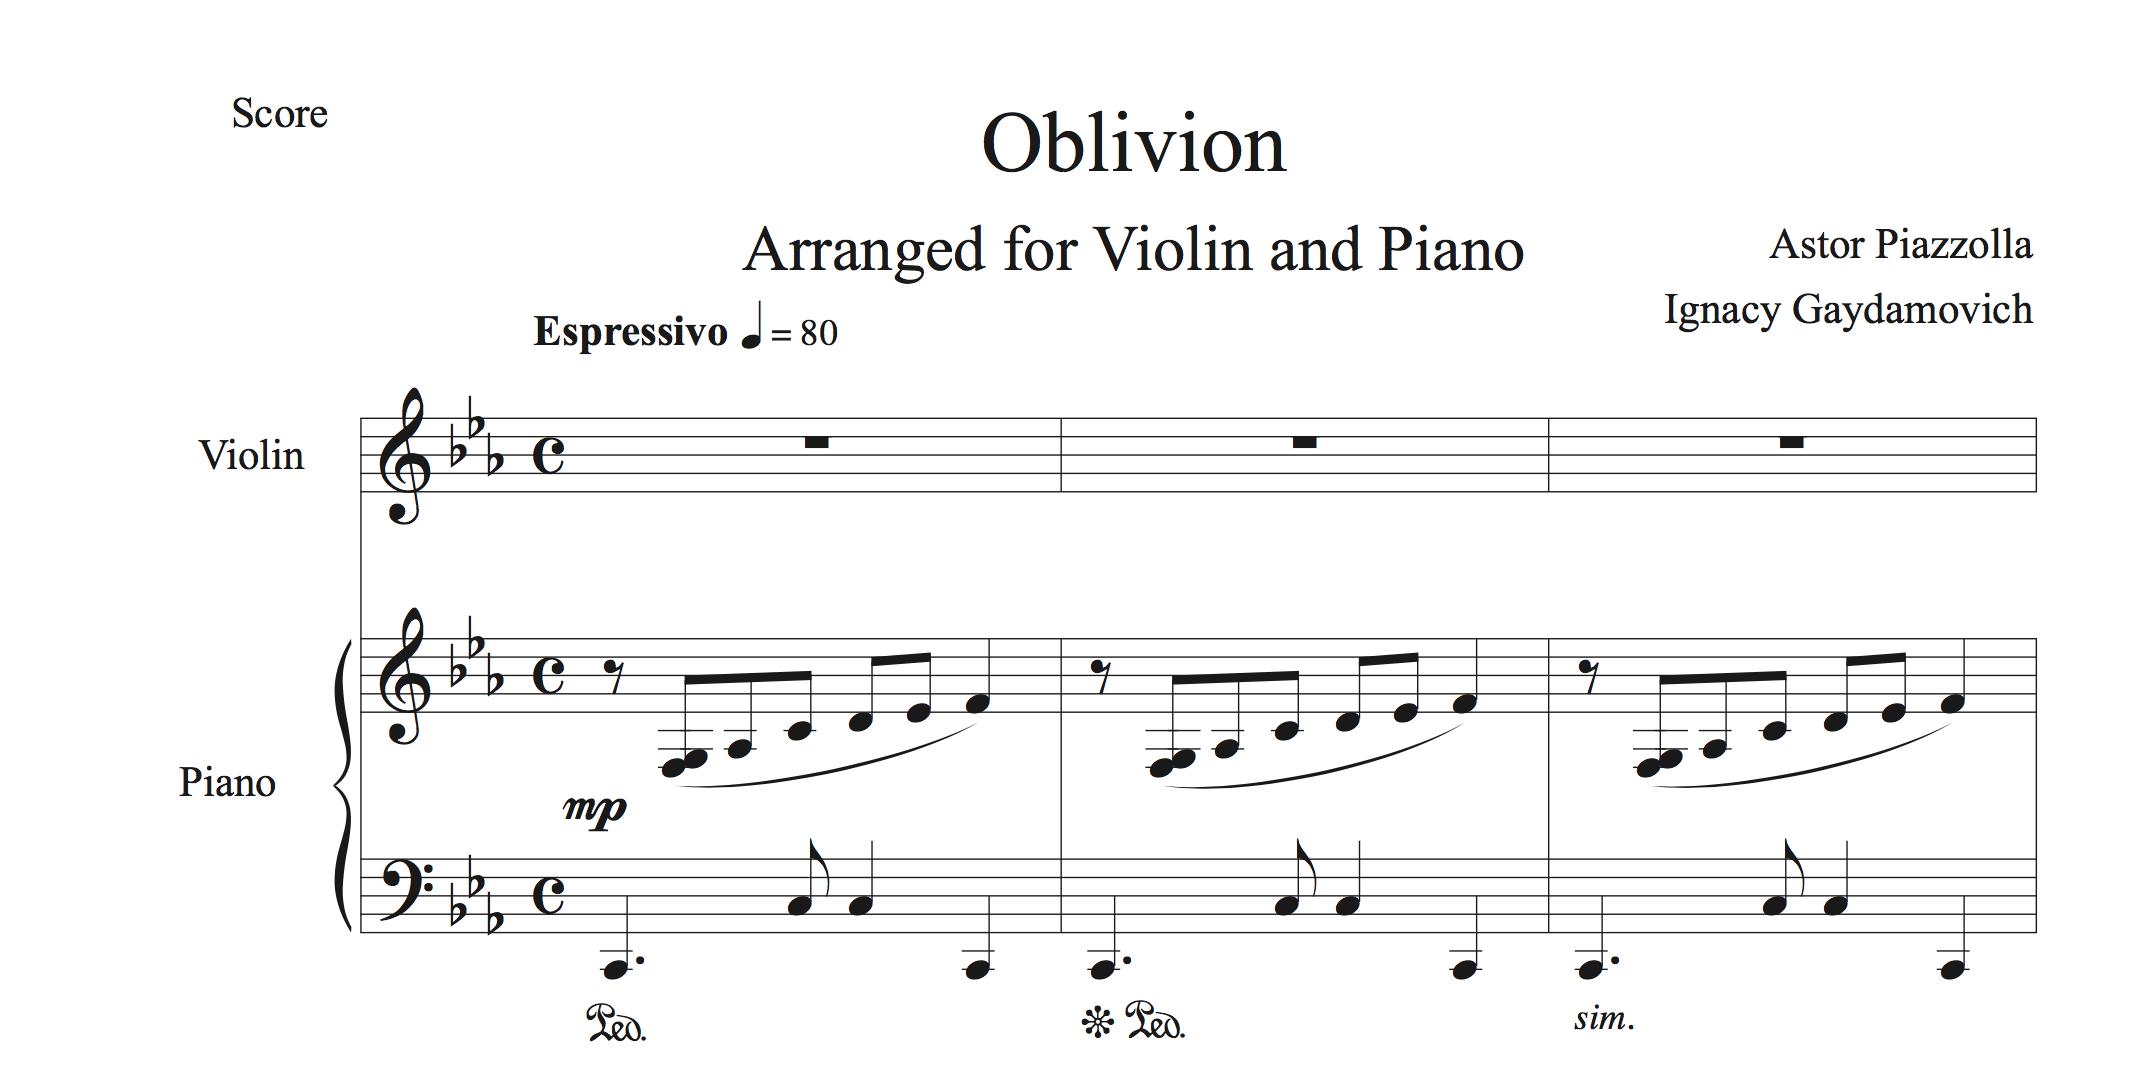 Astor Piazzolla - Oblivion for Violin and Piano - PDF — Ignacy Gaydamovich